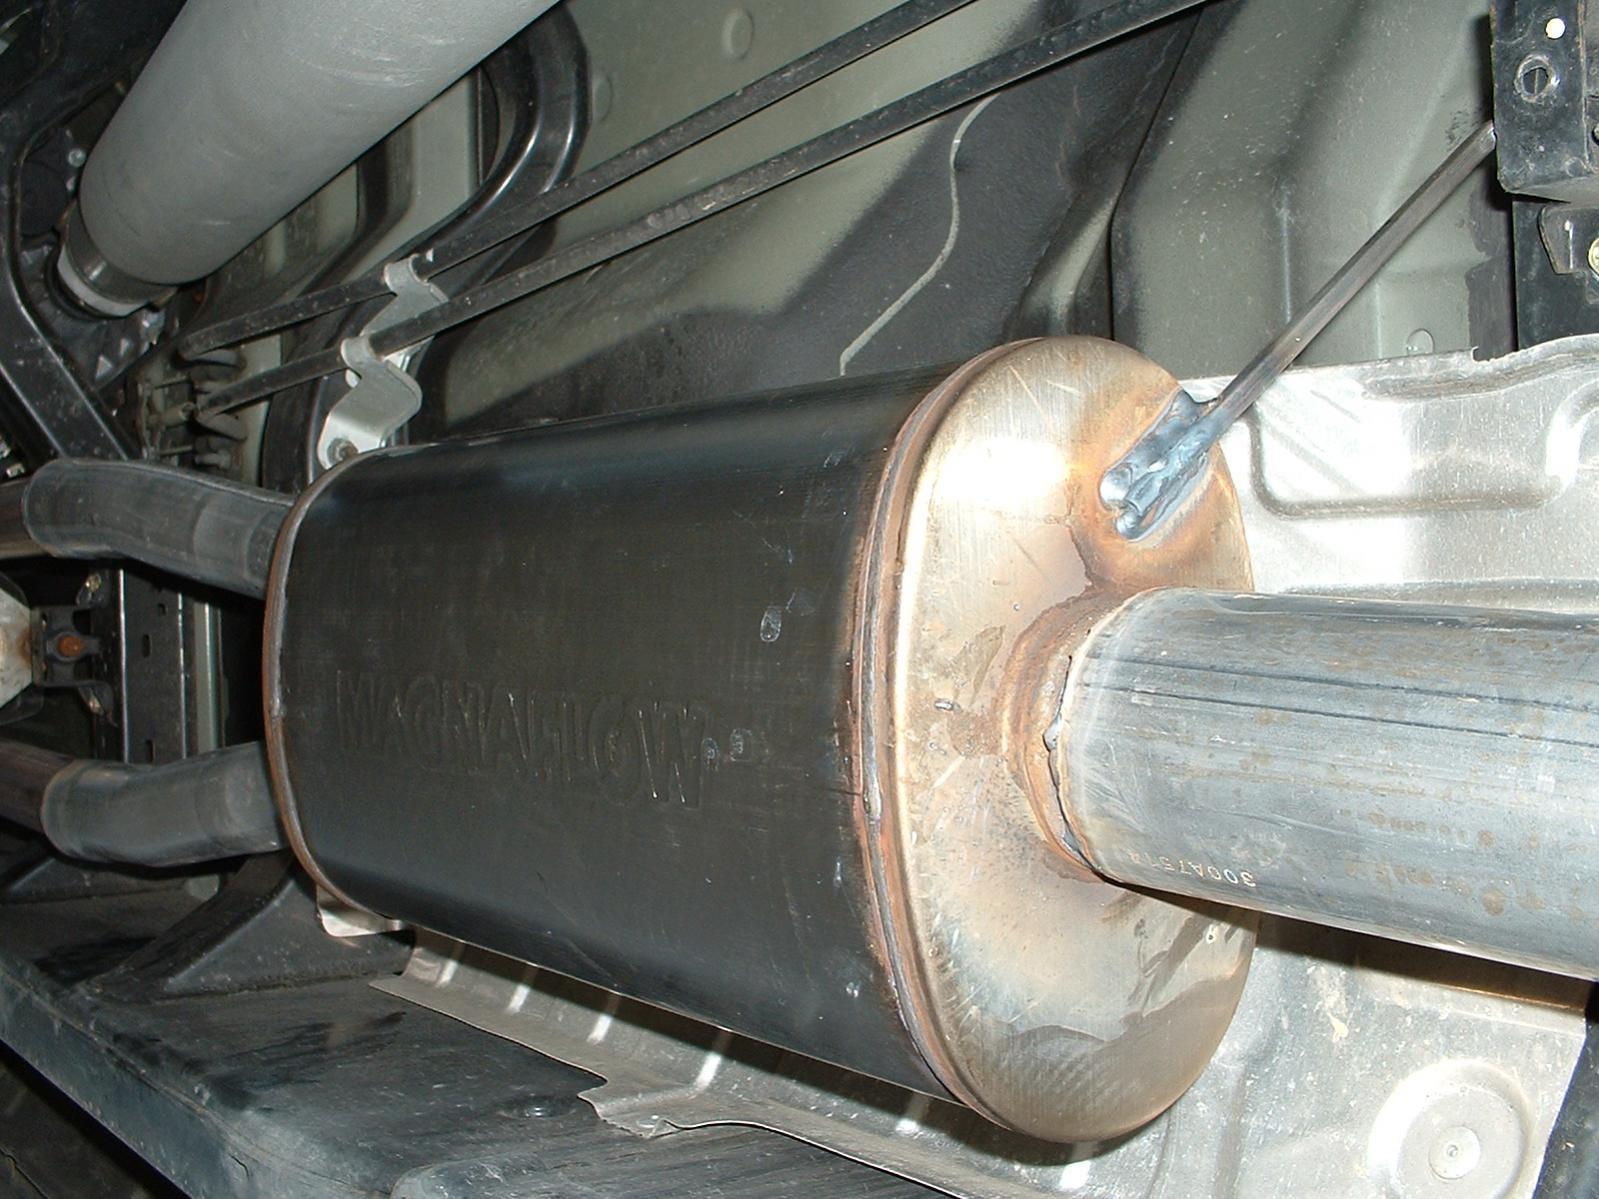 07 oem exhaust what muffler magnaflow install 005 jpg